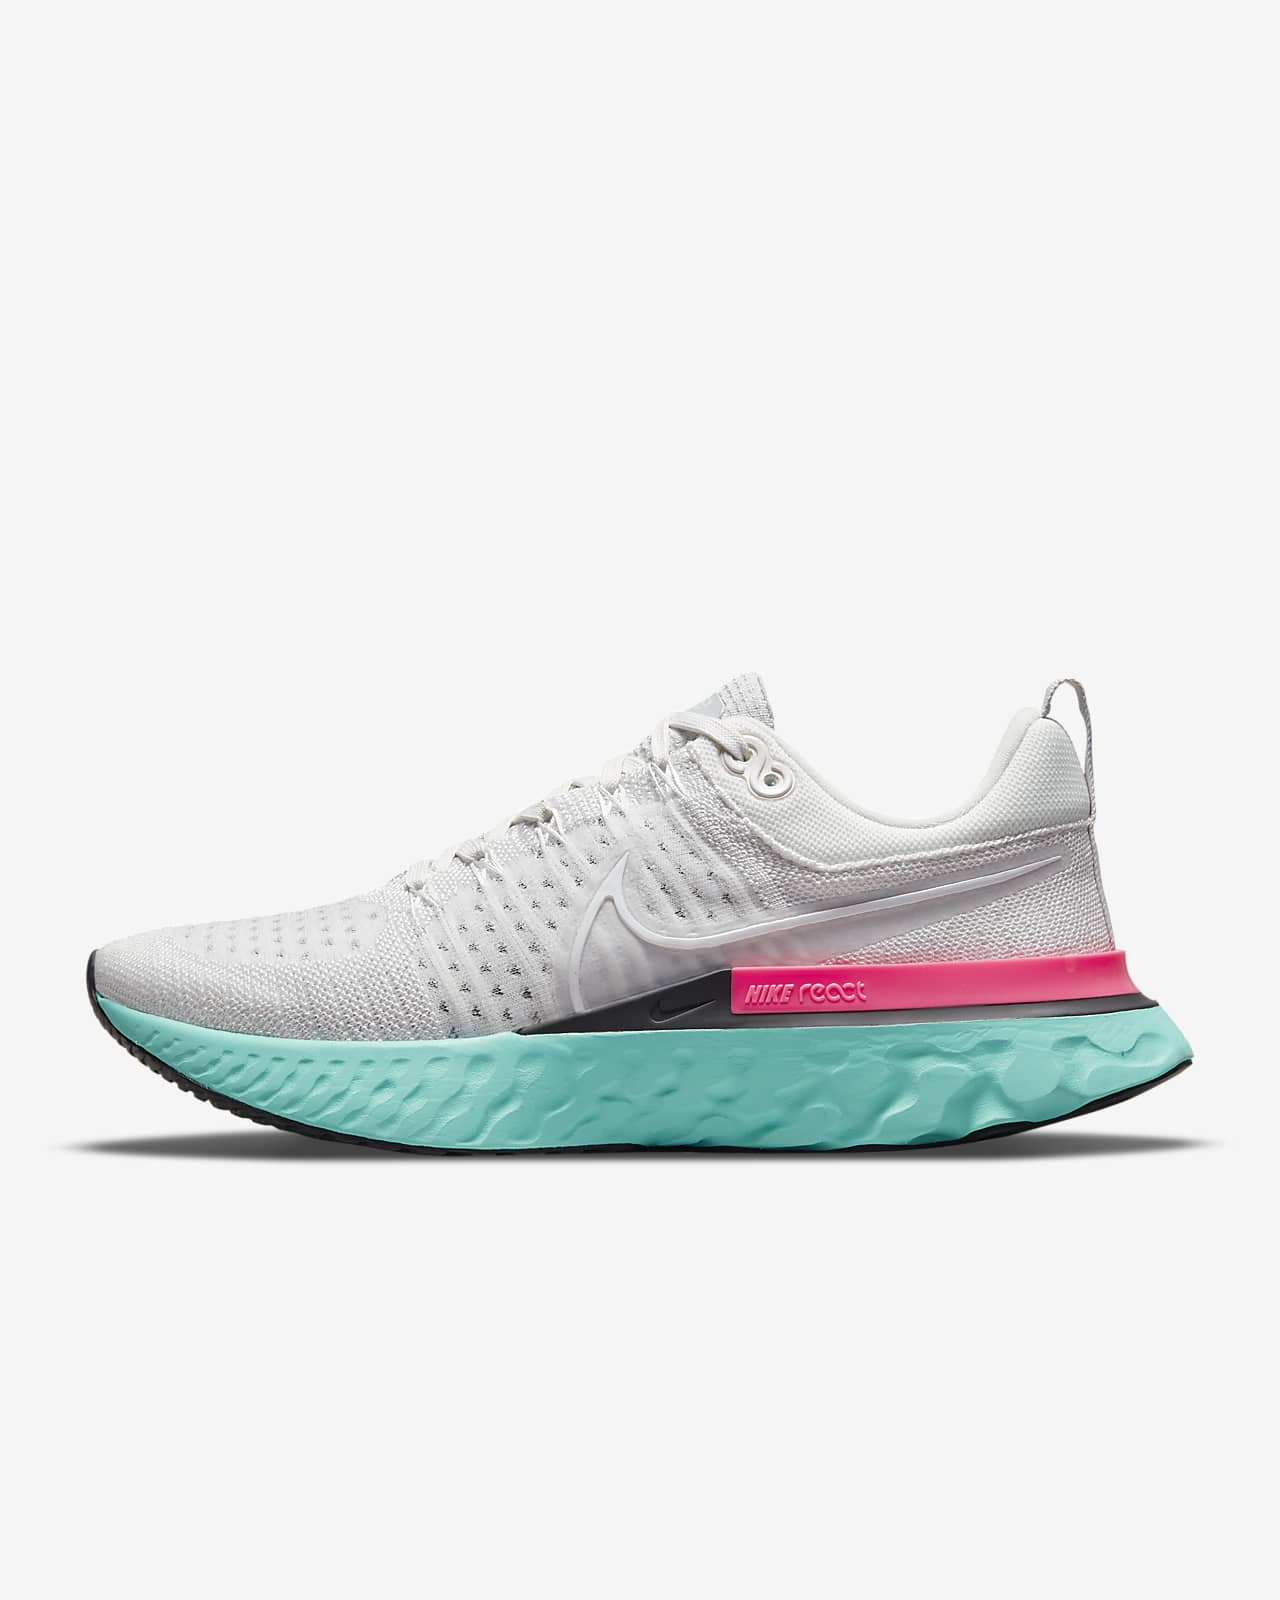 Chaussures de running Nike React Infinity Run Flyknit 2 pour Homme ...